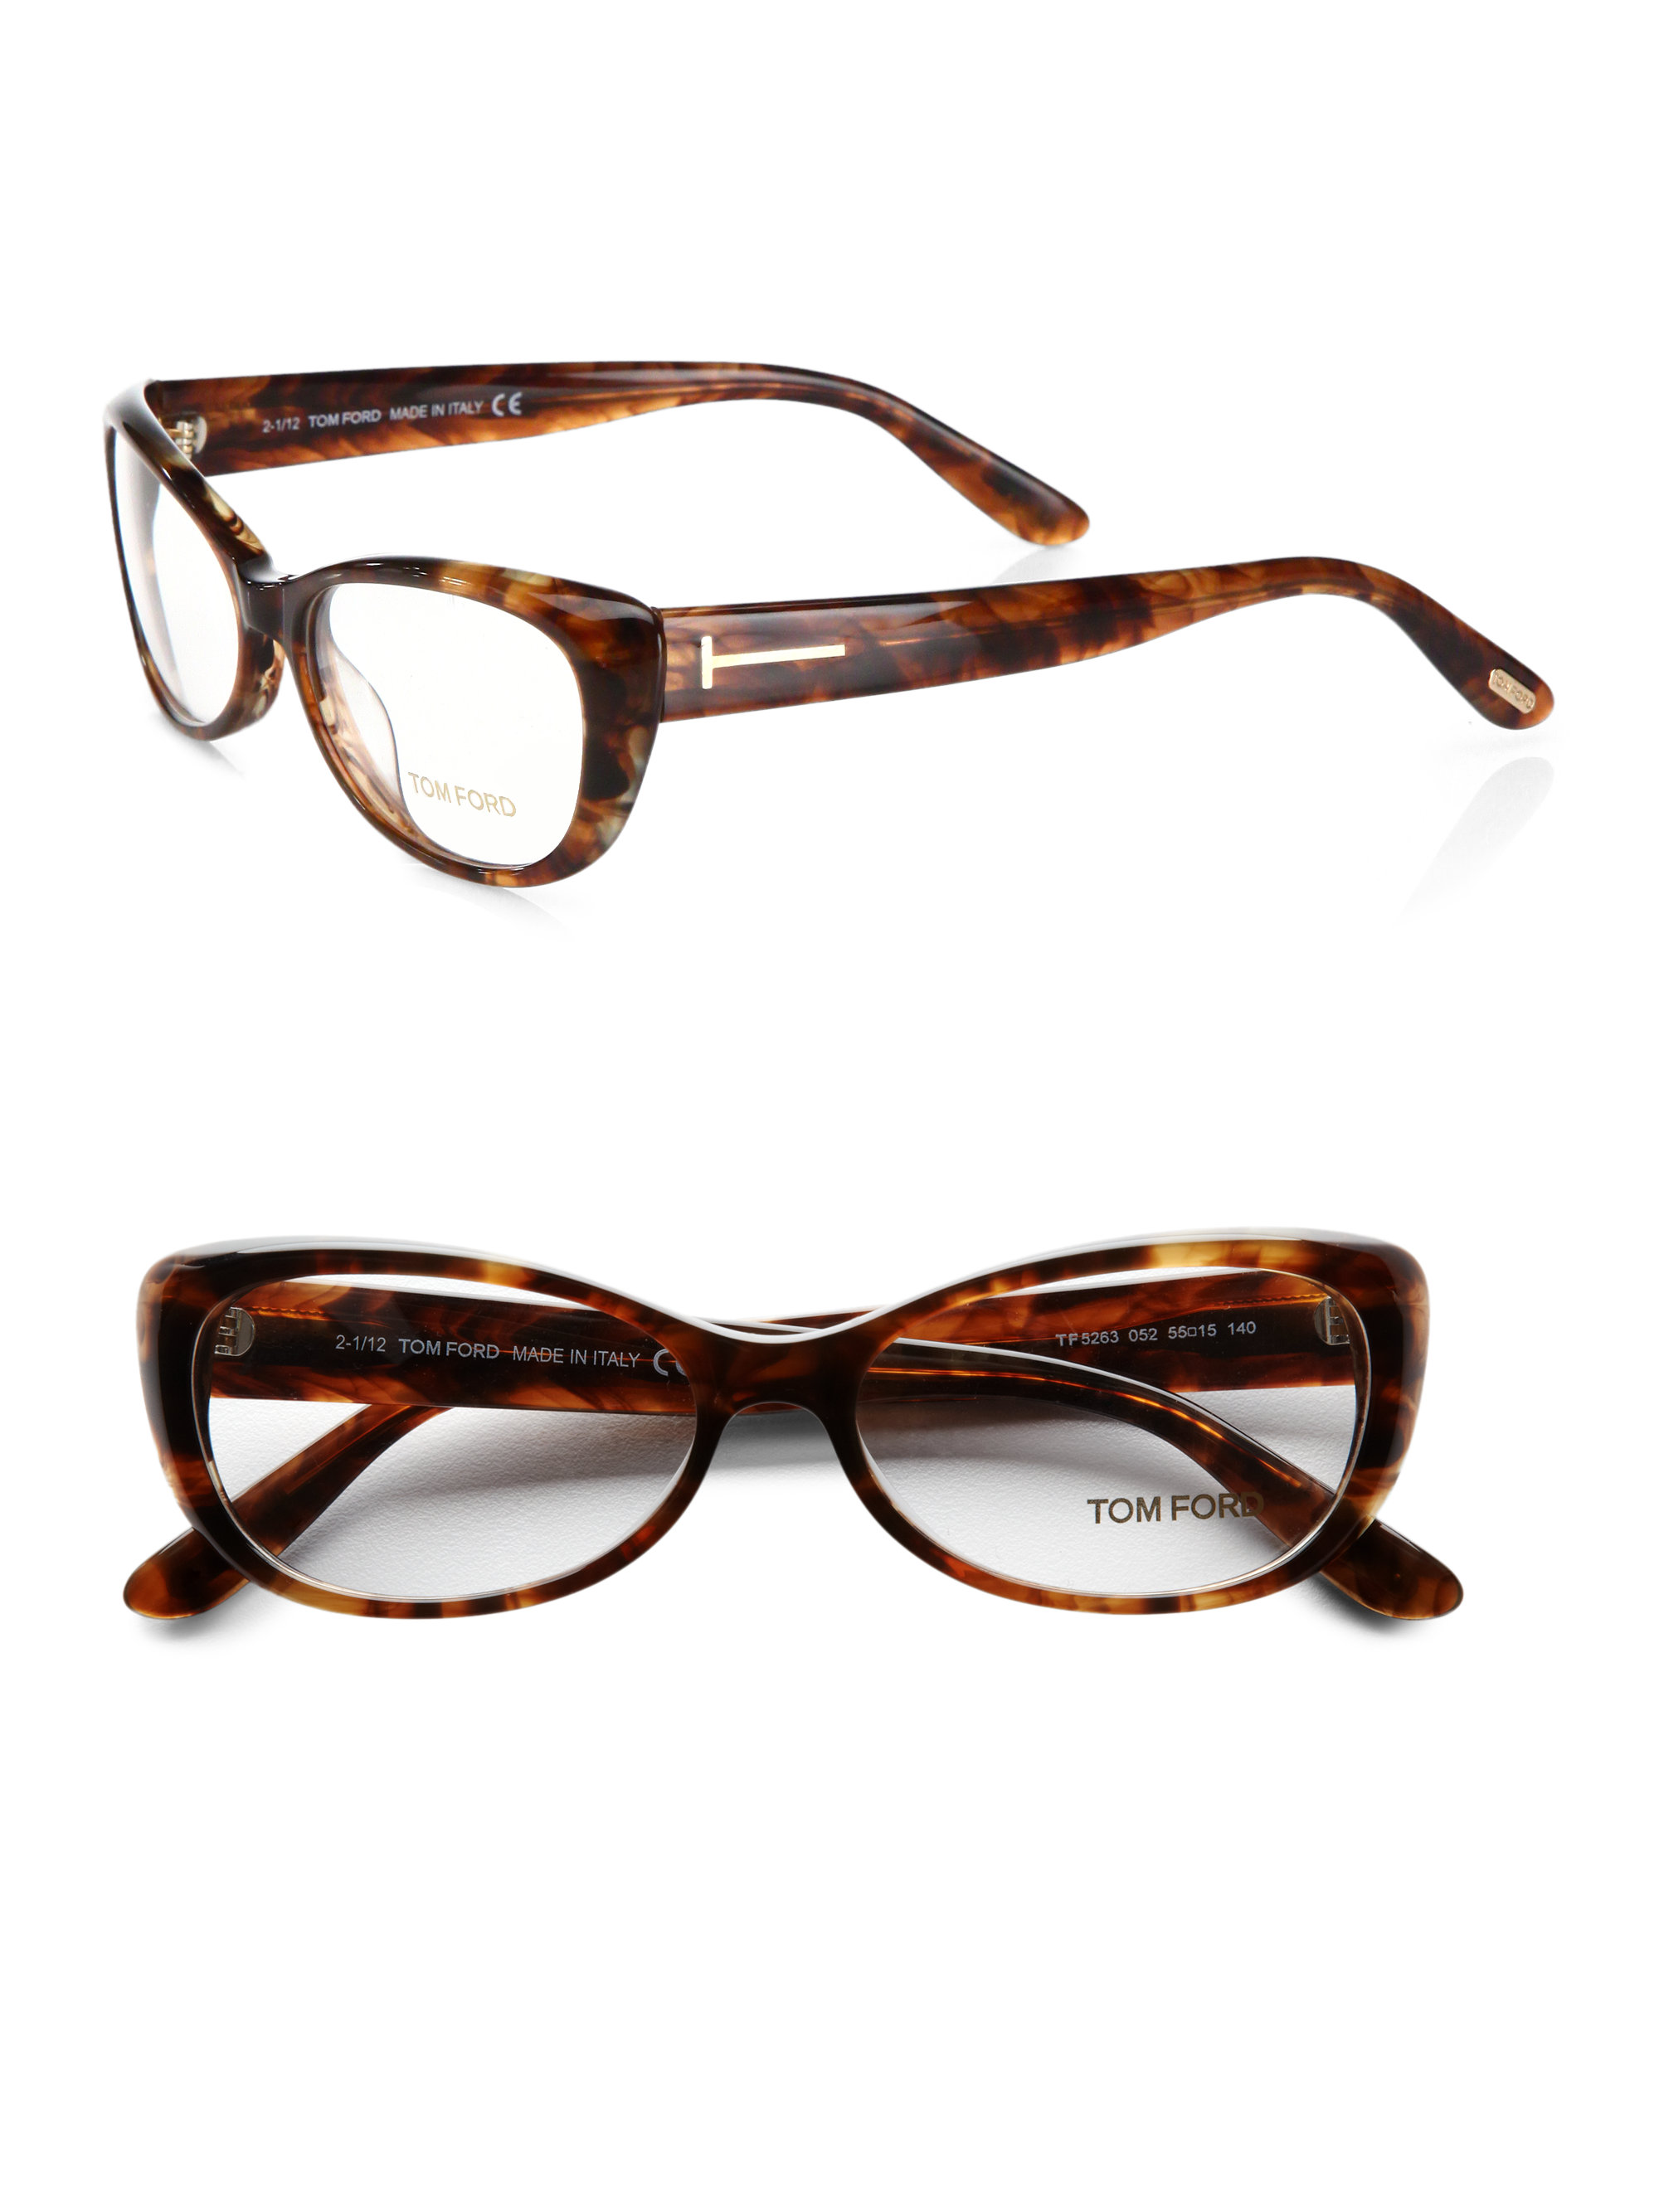 8e5bb281b27 Lyst - Tom Ford Small Rectangular Plastic Eyeglasses in Brown